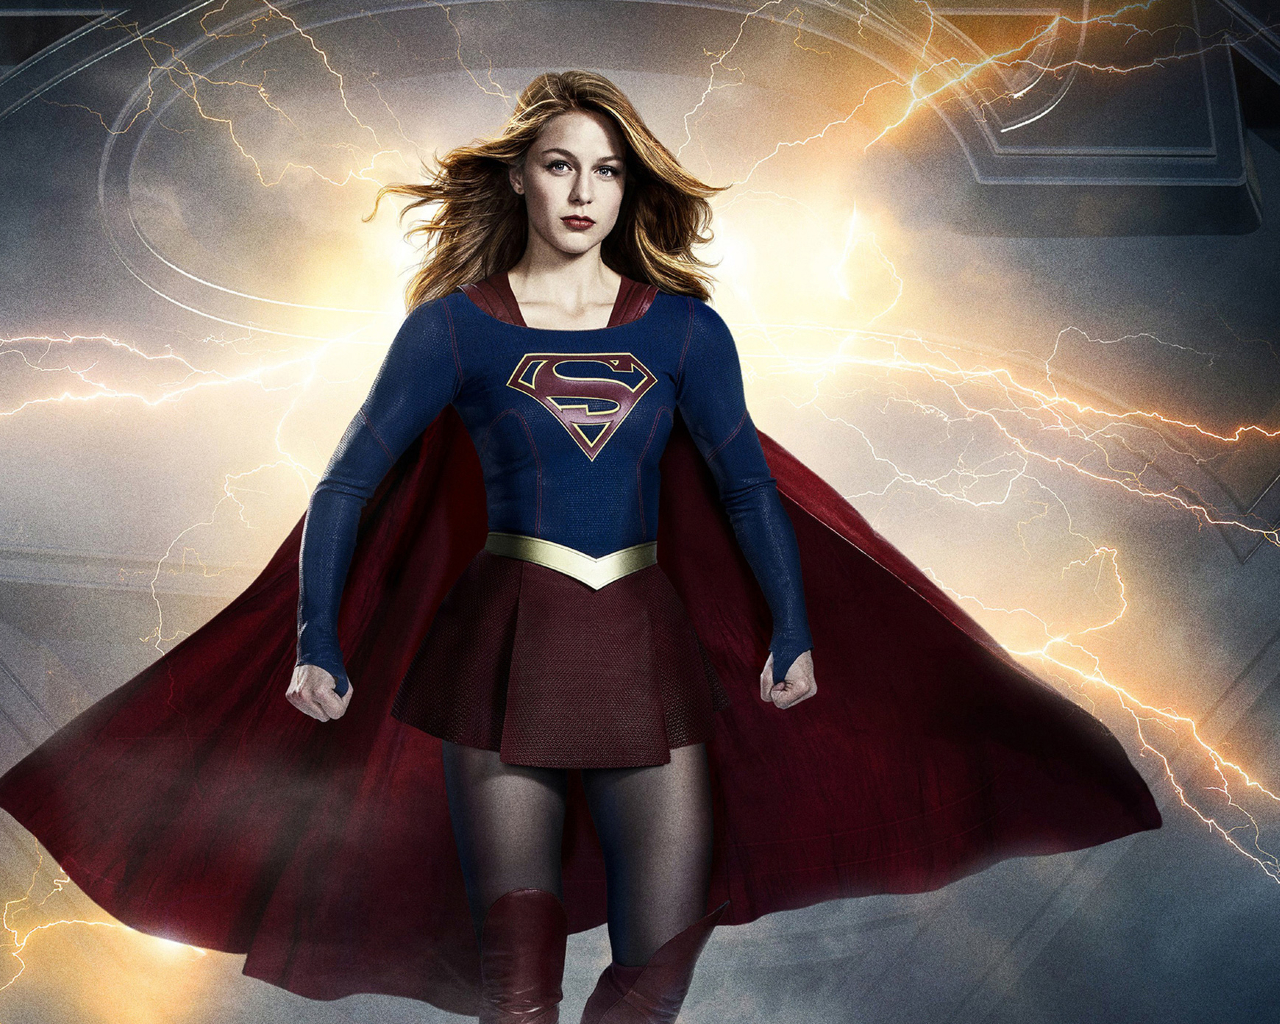 X2 Poster Supergirl Season 3 Pos...